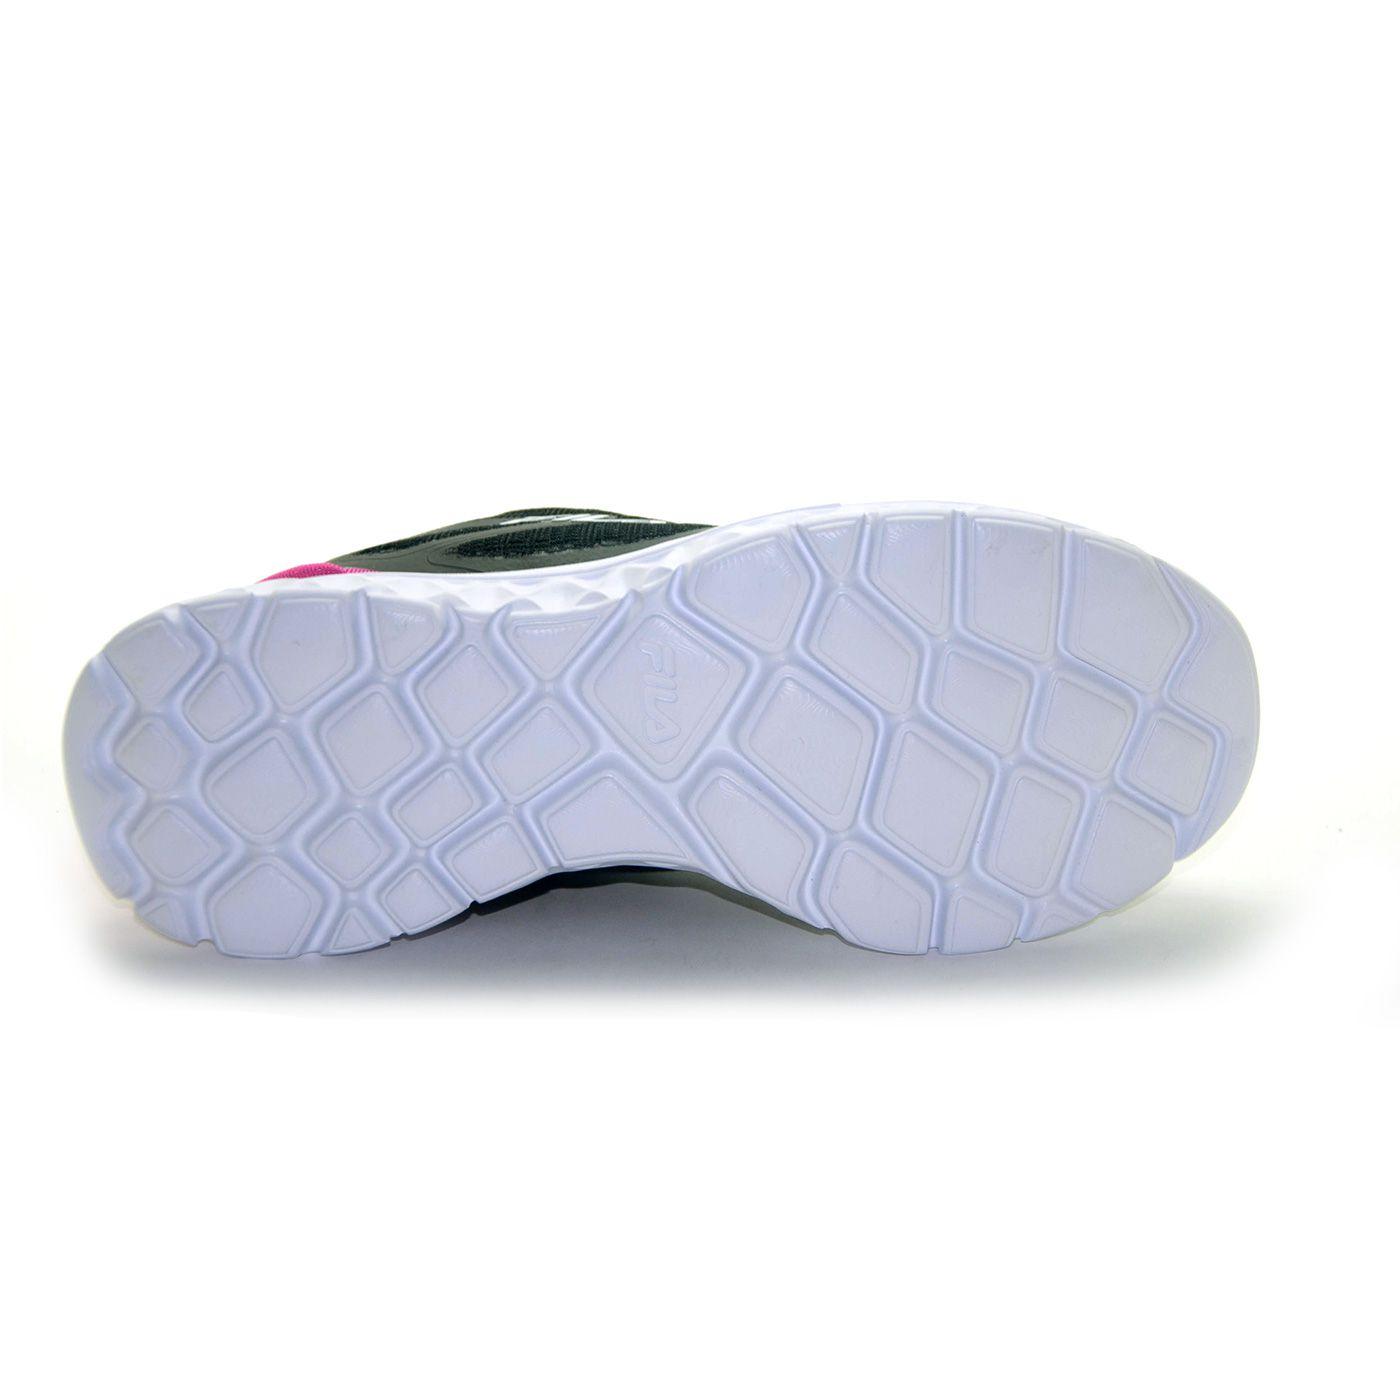 TENIS FILA WOMAN FOOTWEAR LADY - 51J608X